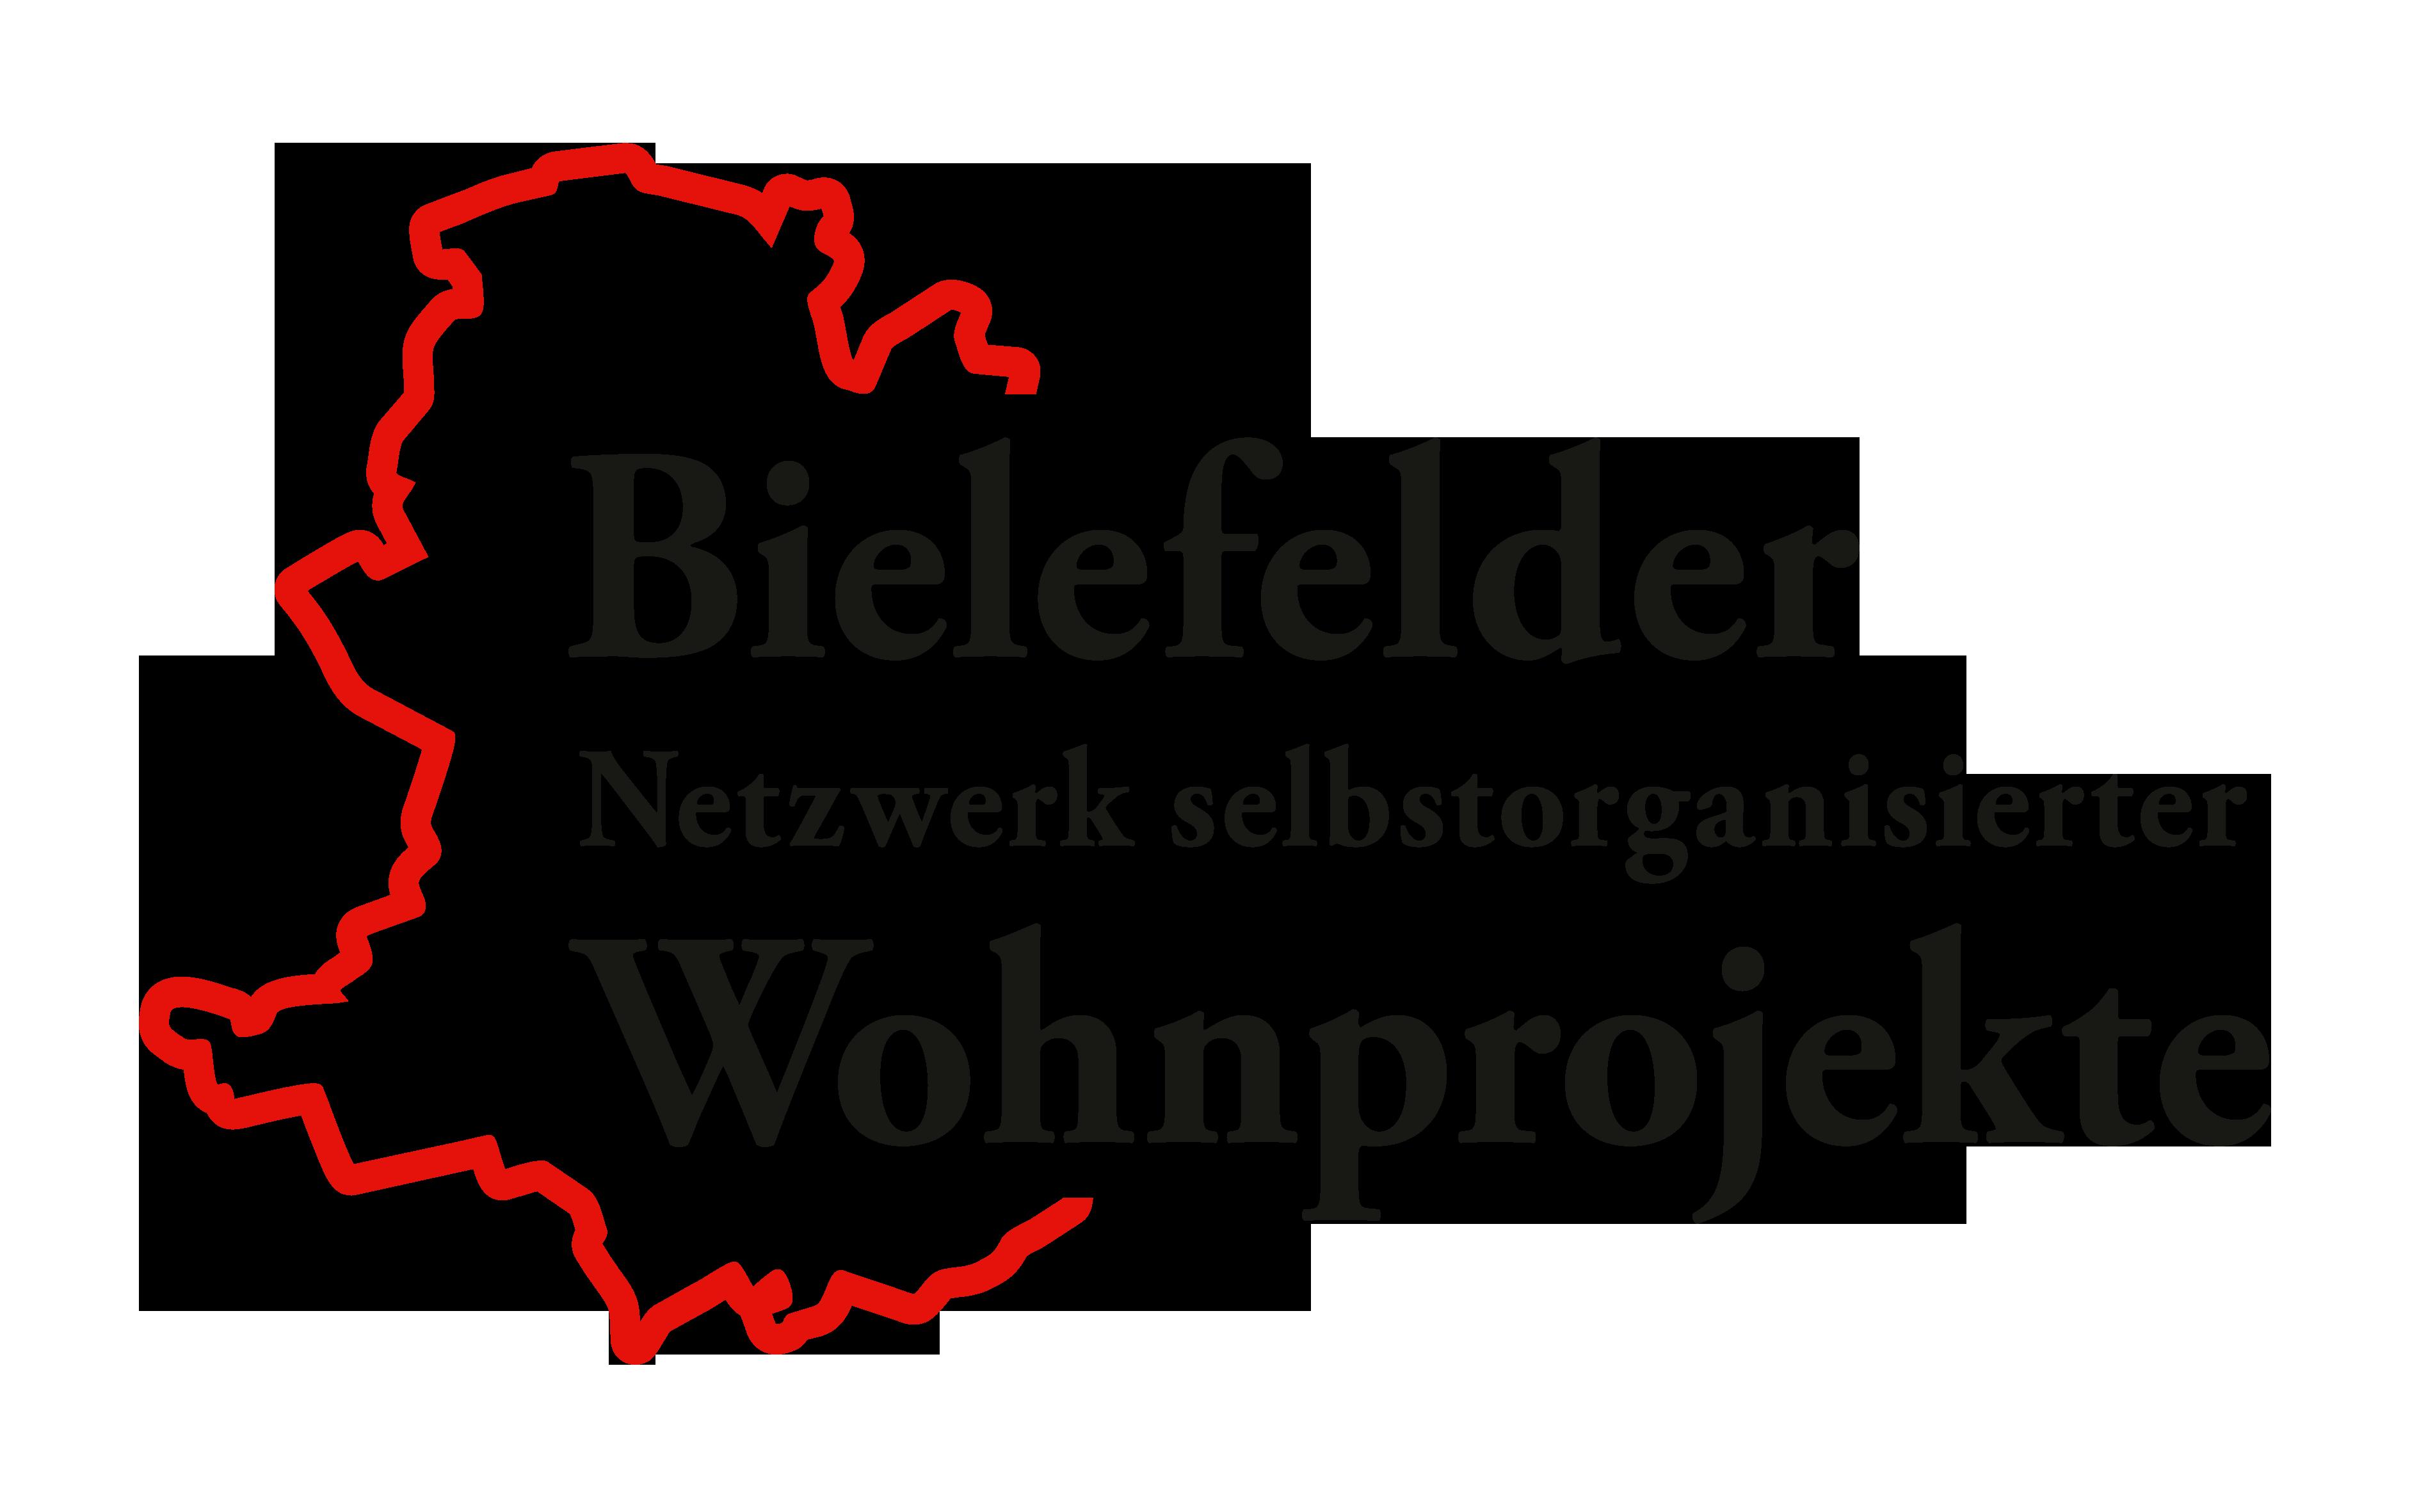 Bielefelder Netzwerk selbstorganisierter Wohnprojekte e.V.